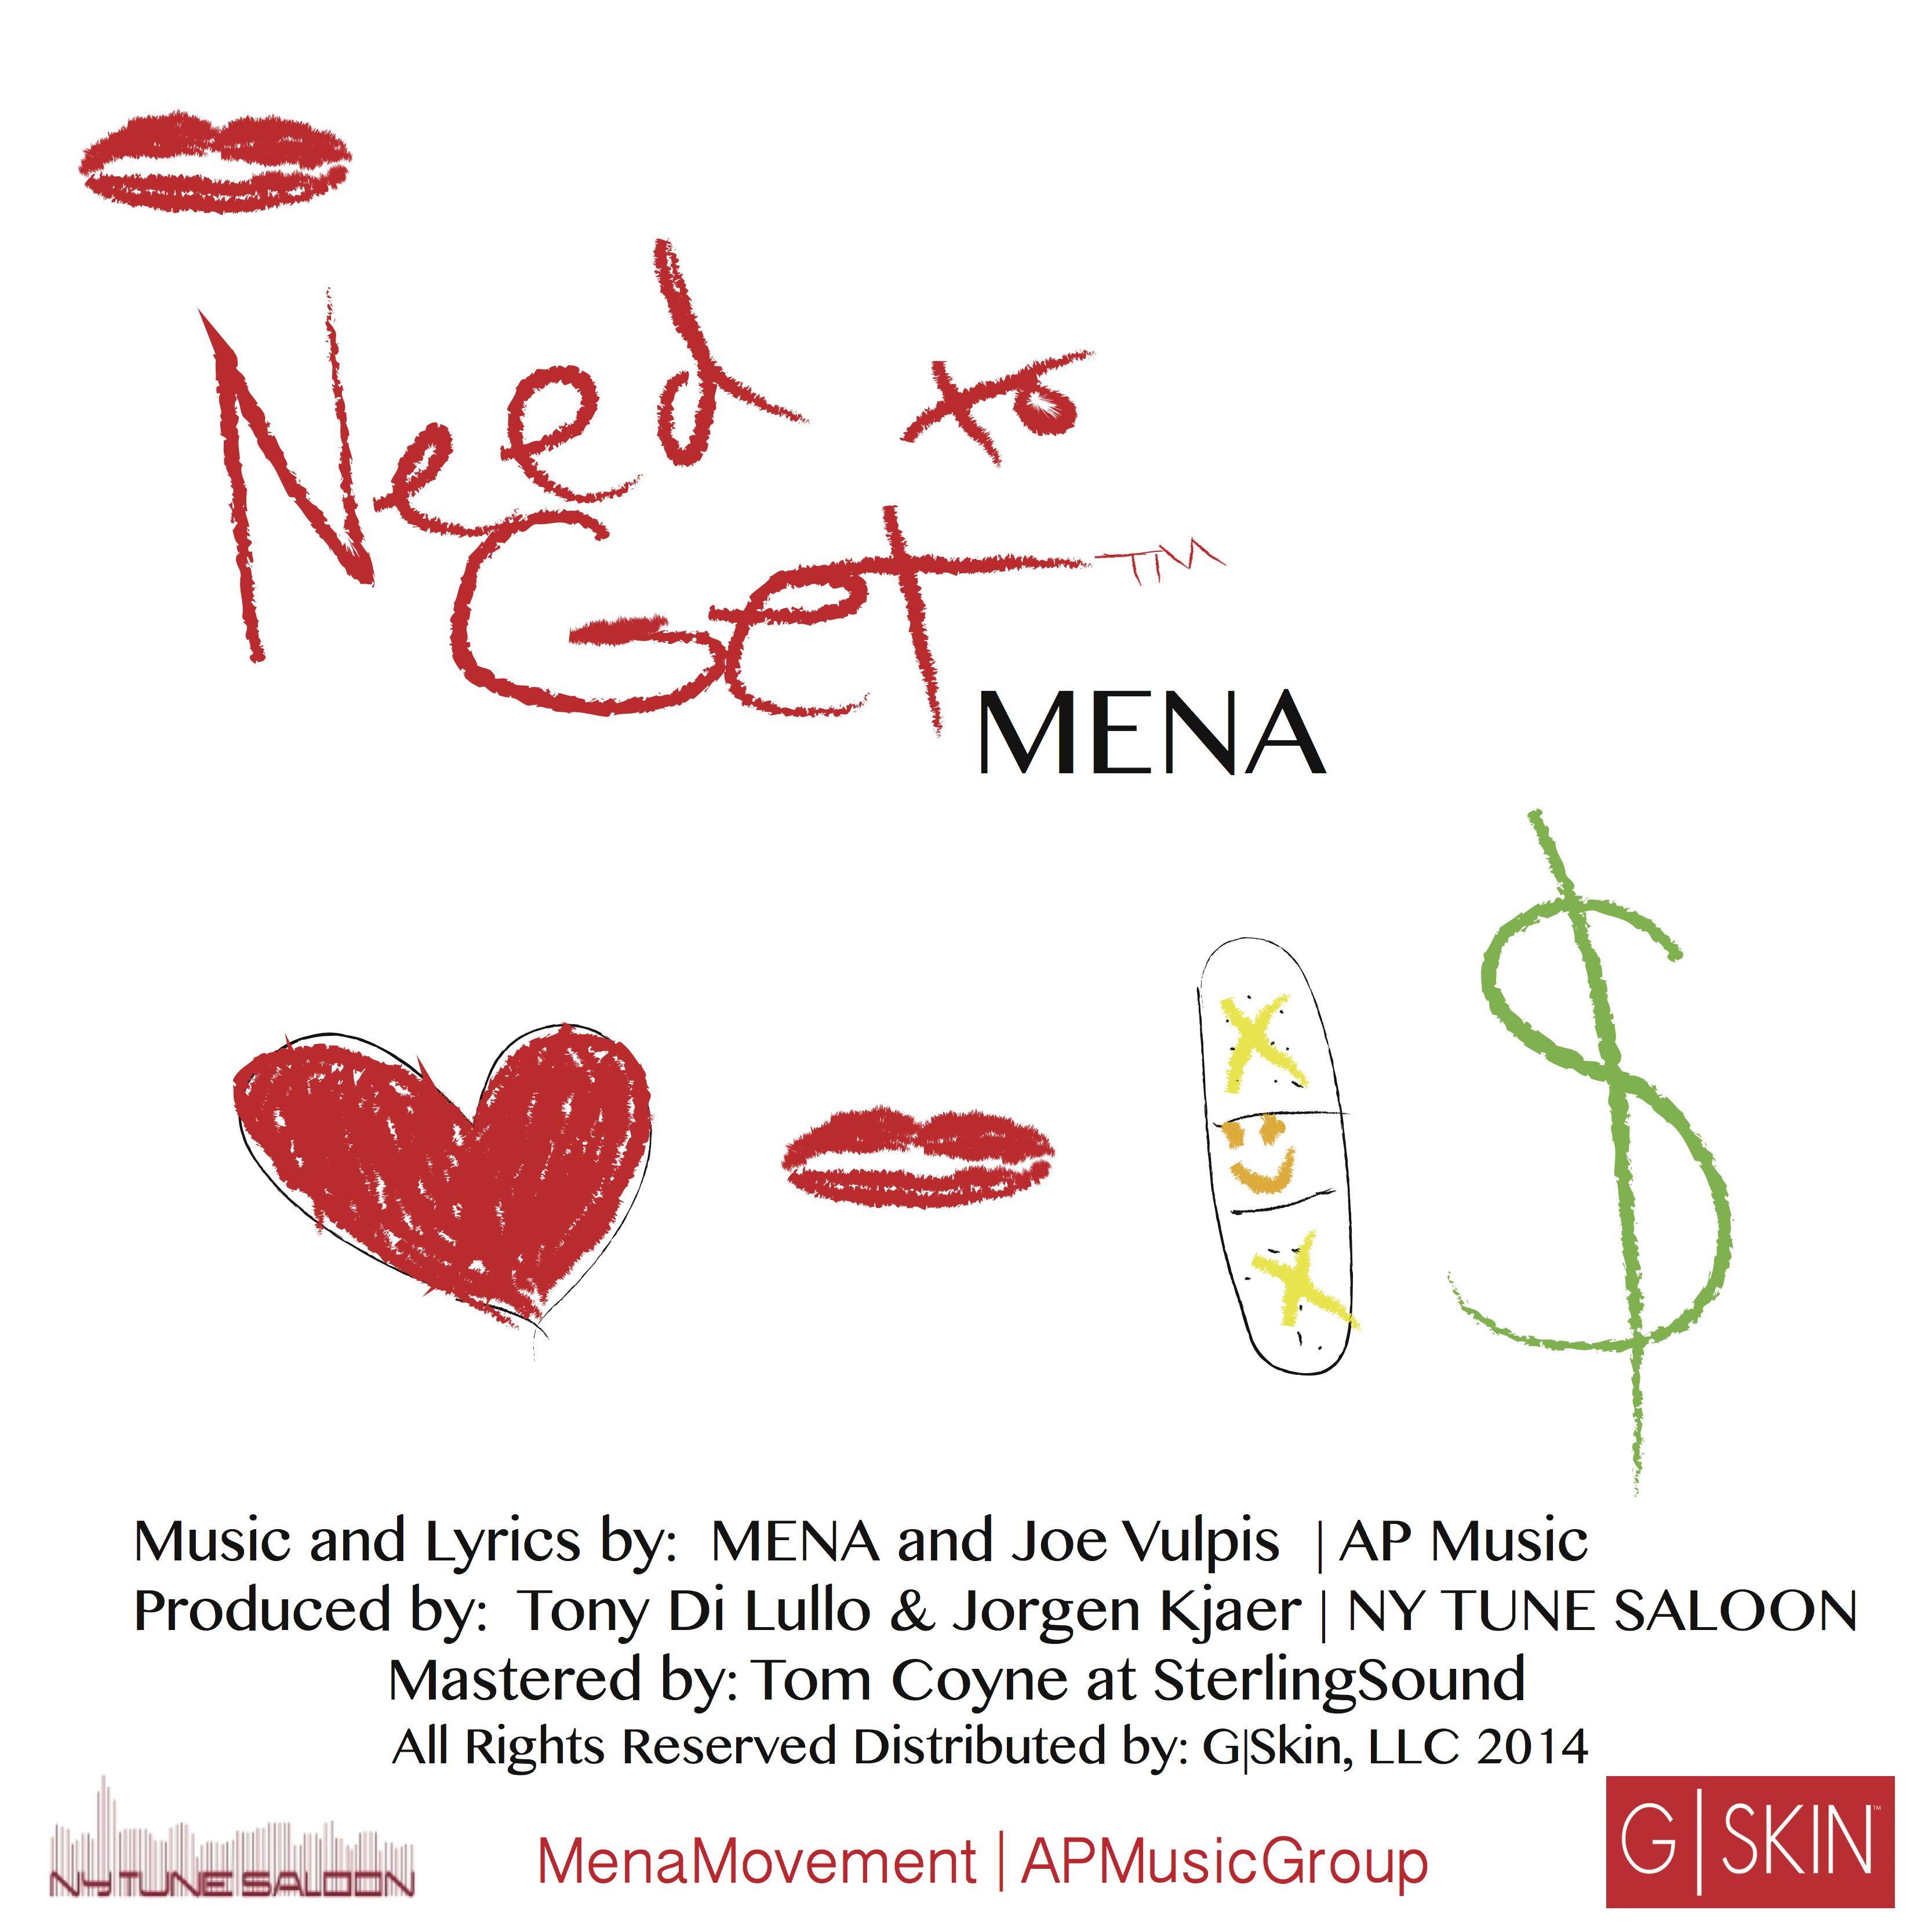 NEED TO GET Mena _ MenaMovement